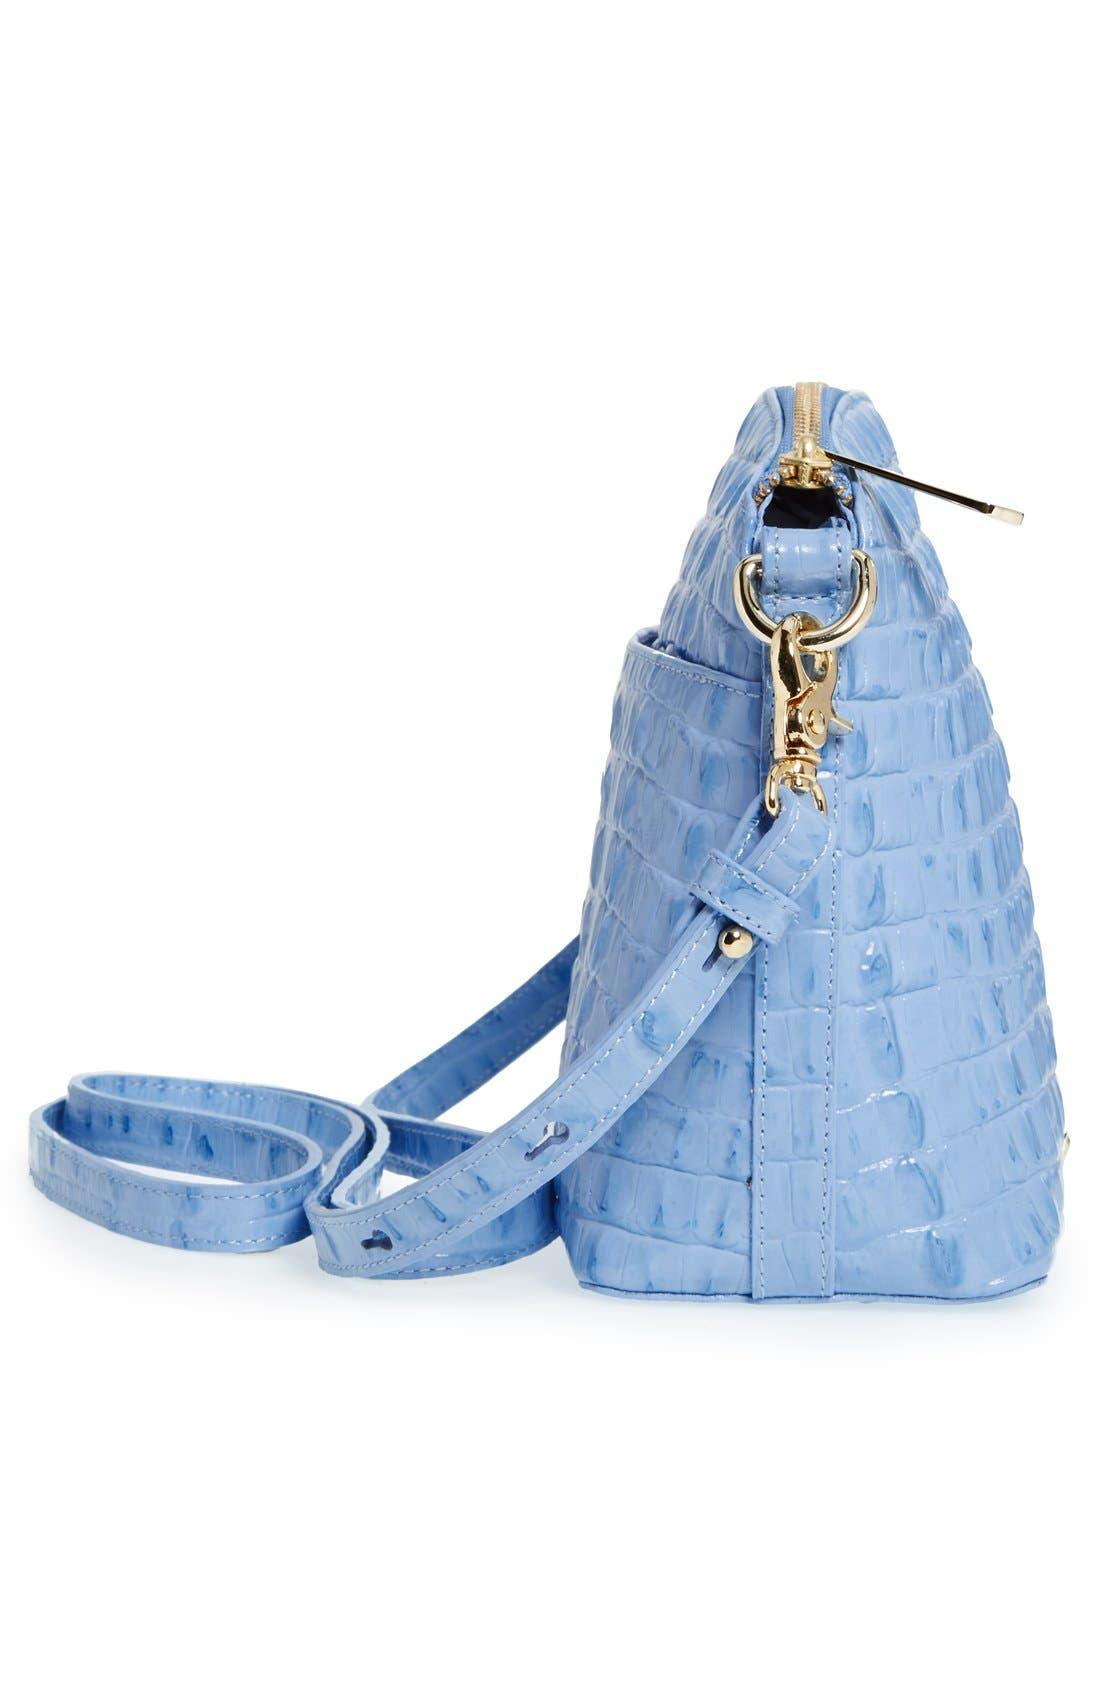 Alternate Image 5  - Brahmin 'Mini Duxbury' Croc Embossed Leather Crossbody Bag